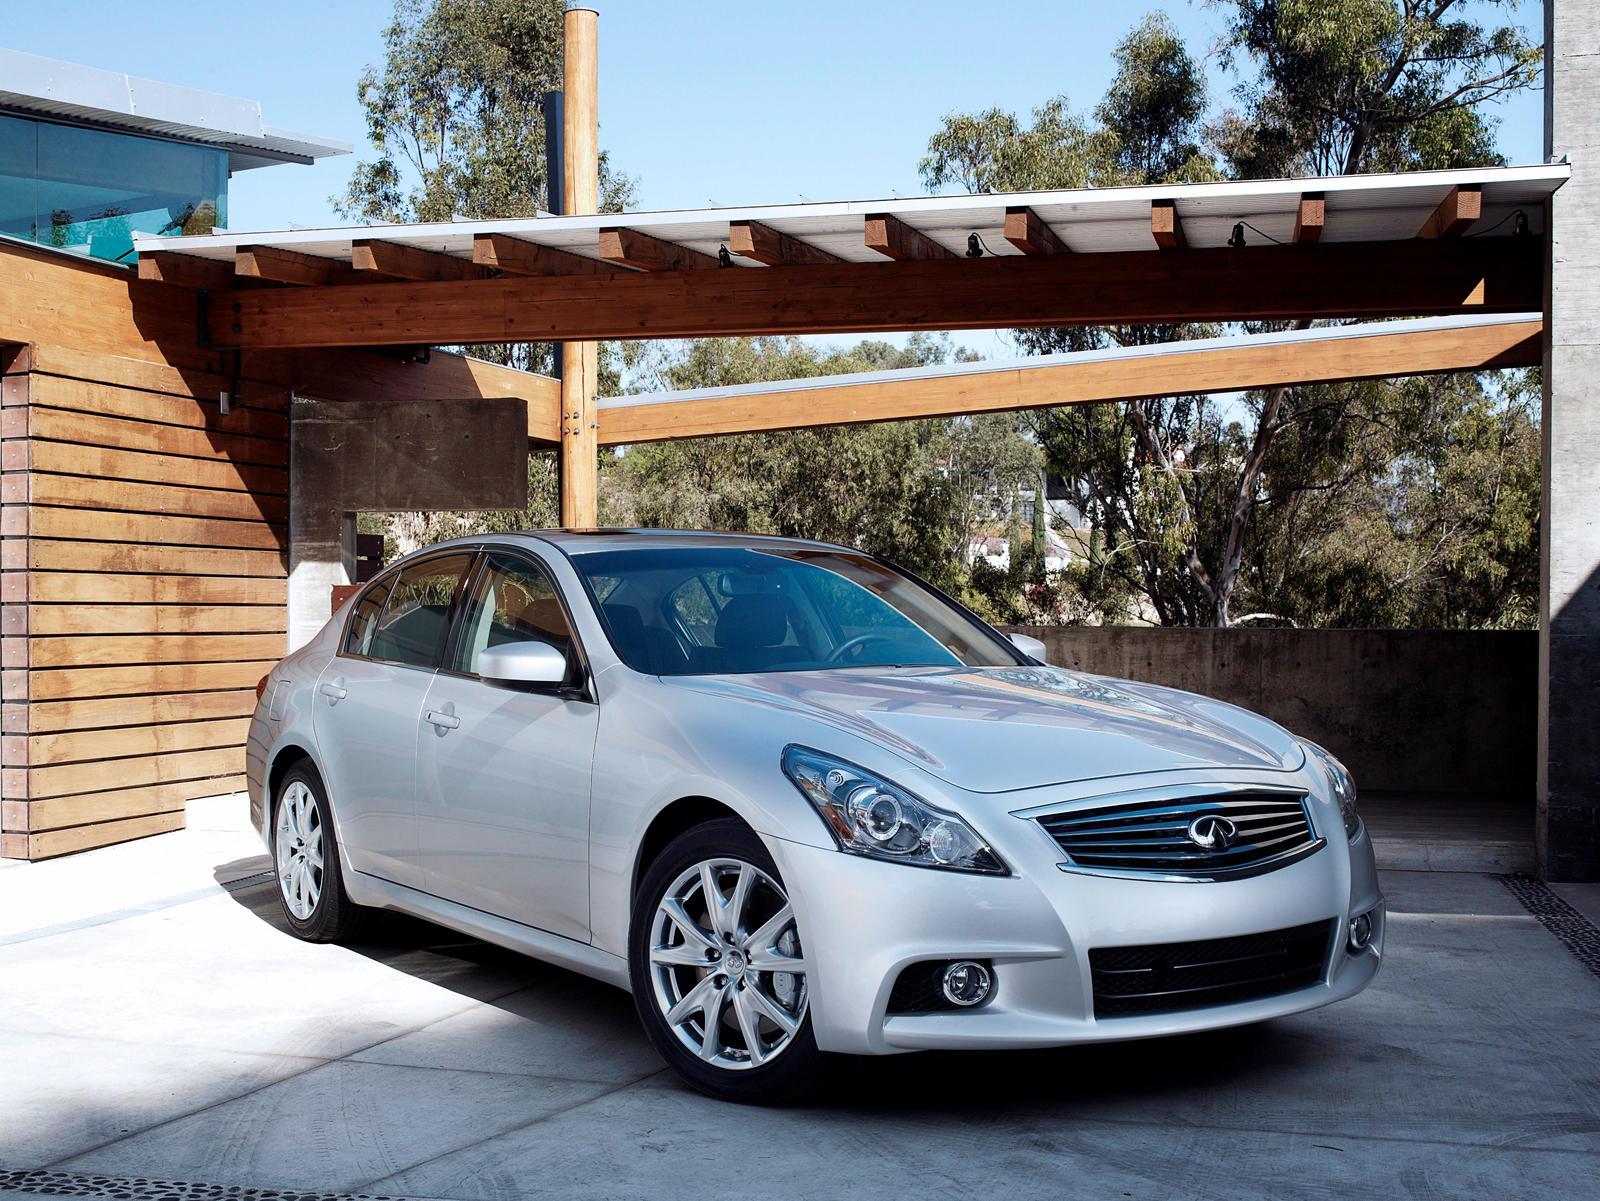 2012 Infiniti G37 Sedan Trims Specs Carbuzz